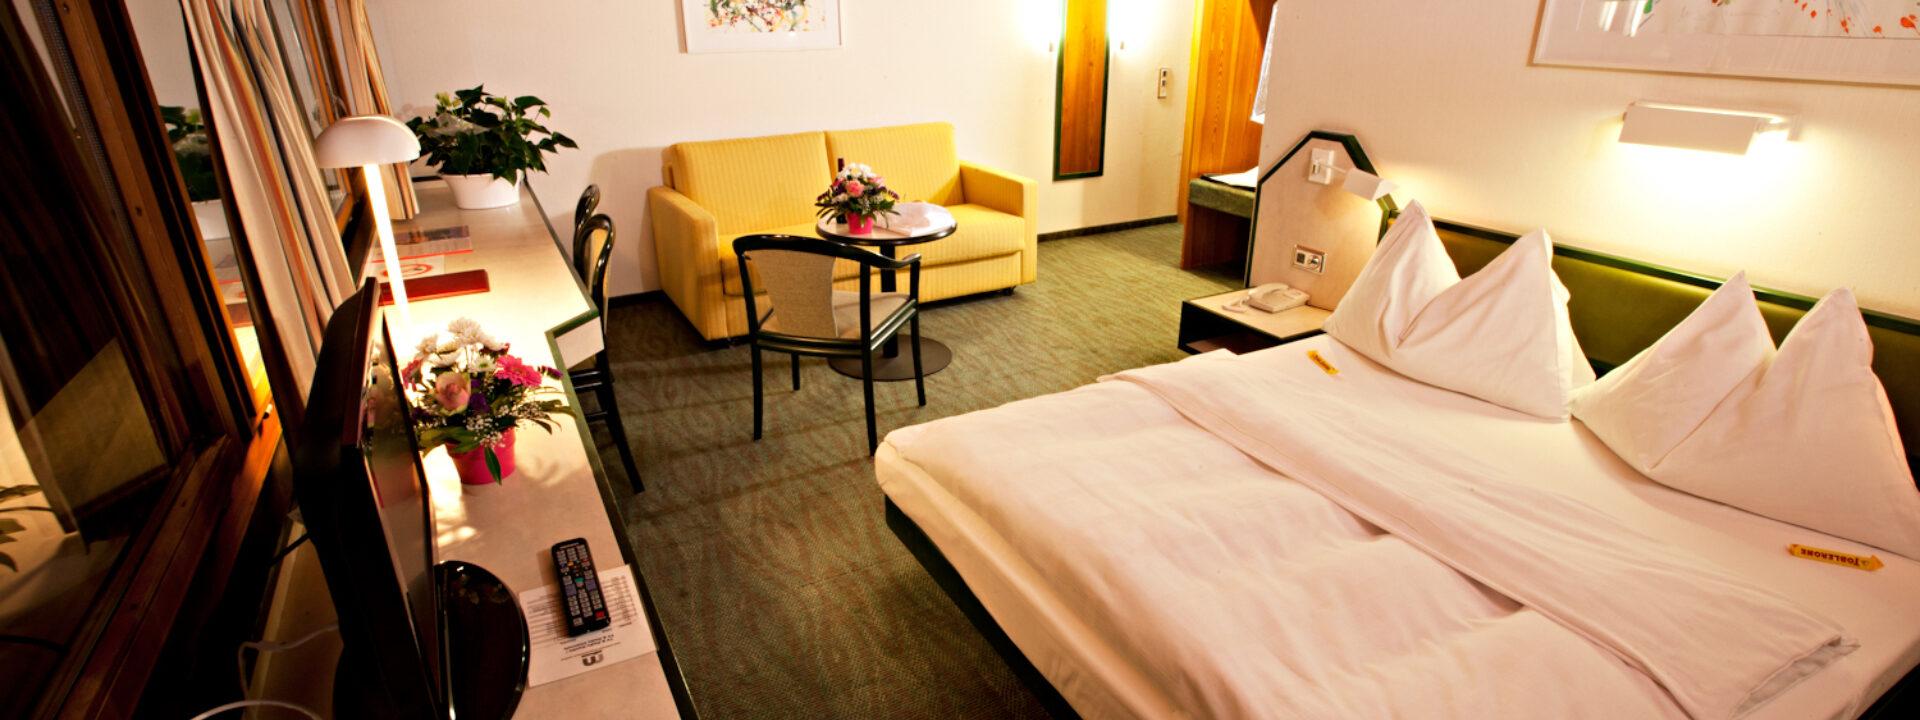 Hotel Garni Mittenza